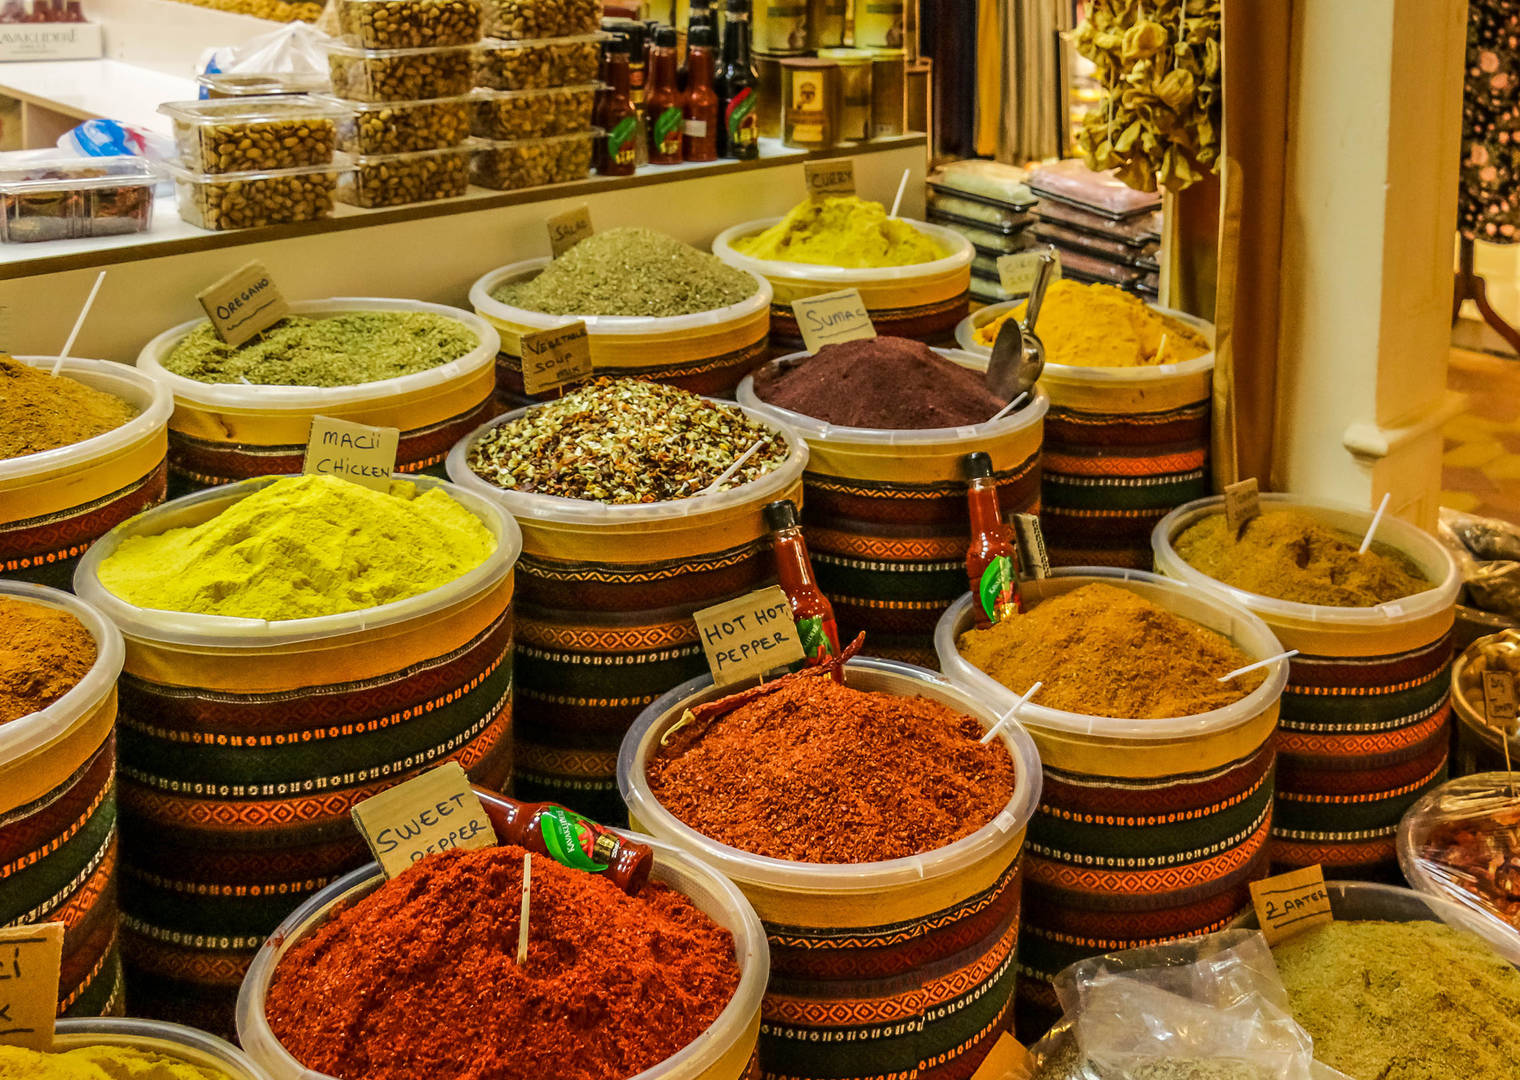 Food global village